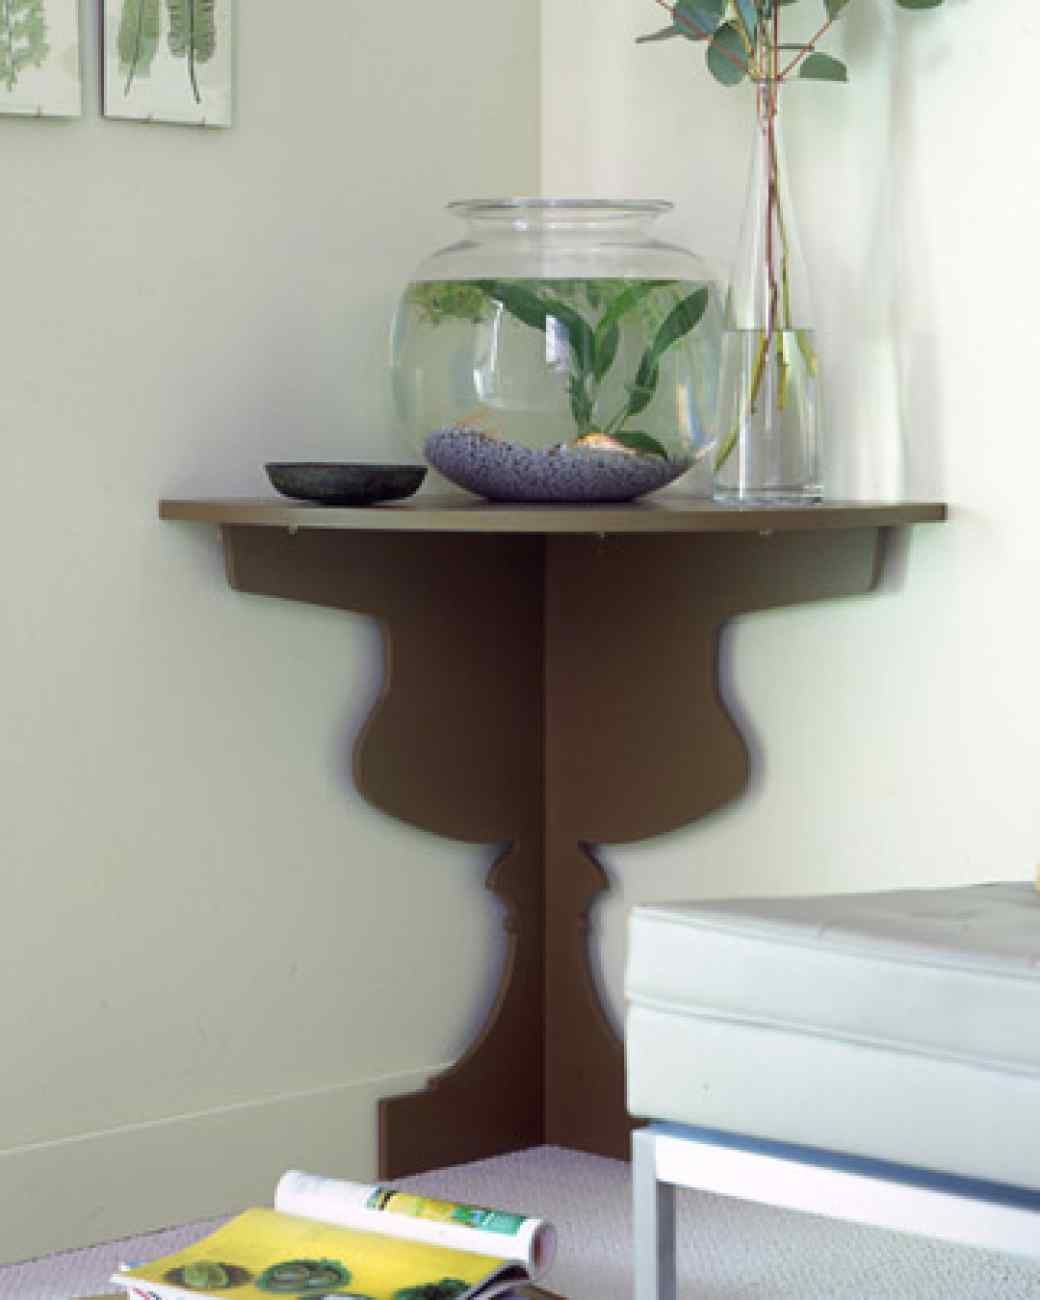 Small Crop Of Corner Shelf Hanging